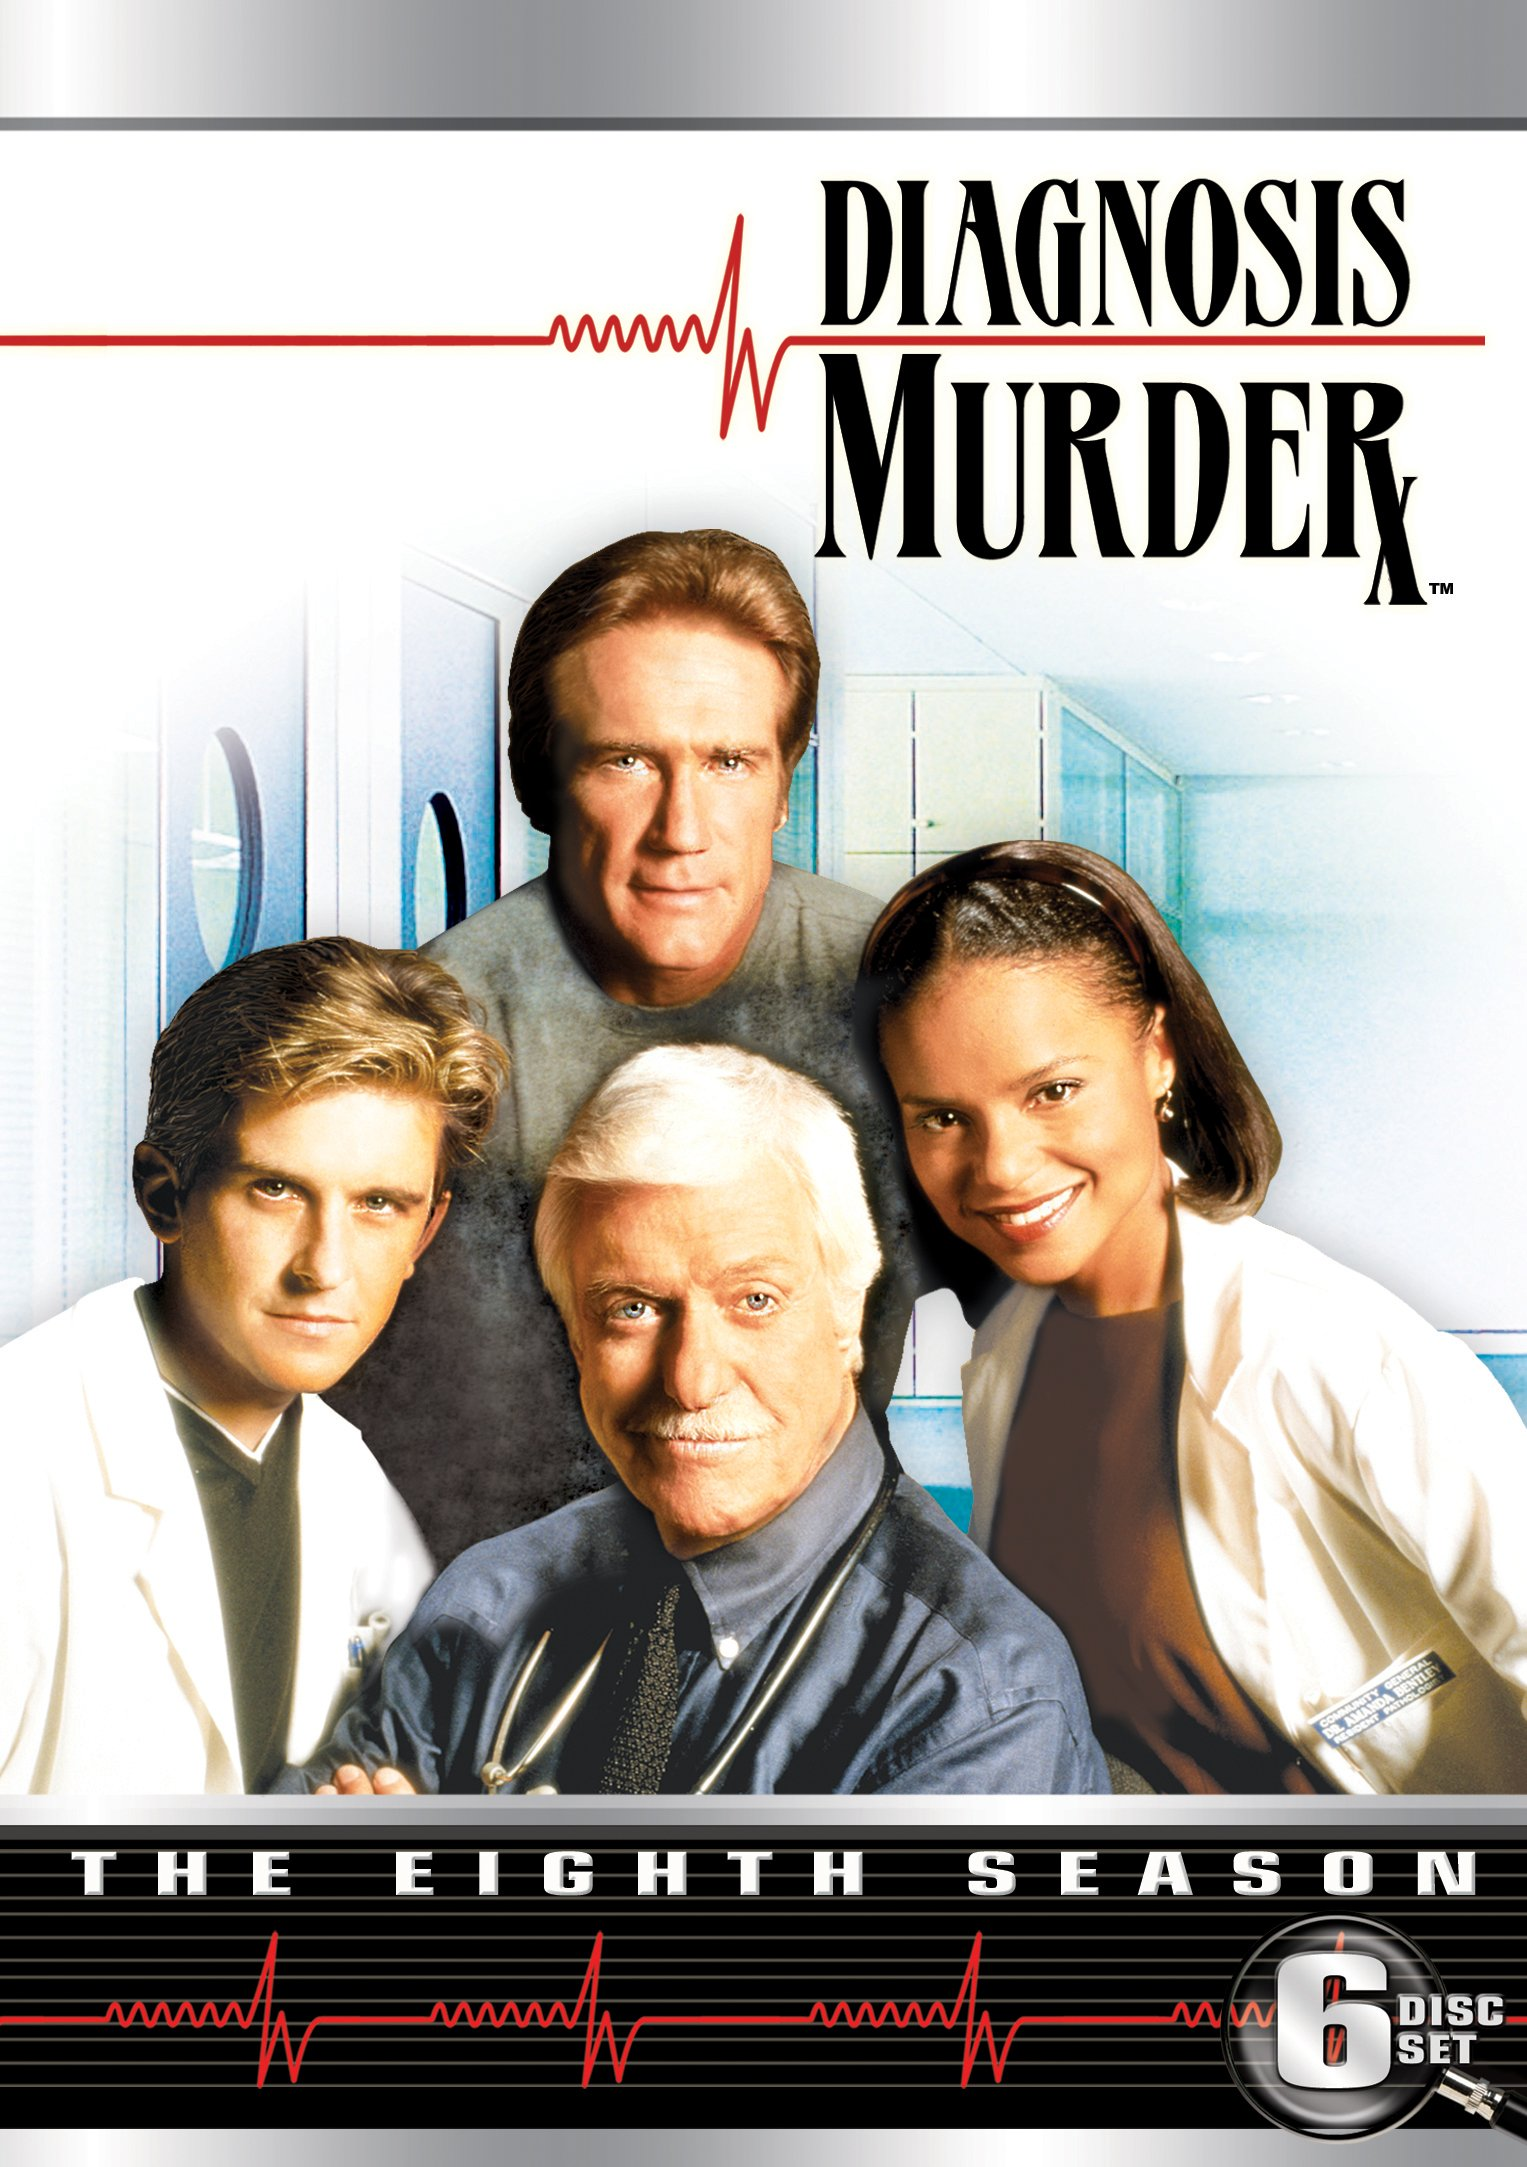 DVD : Diagnosis Murder: The Eighth Season (DVD)